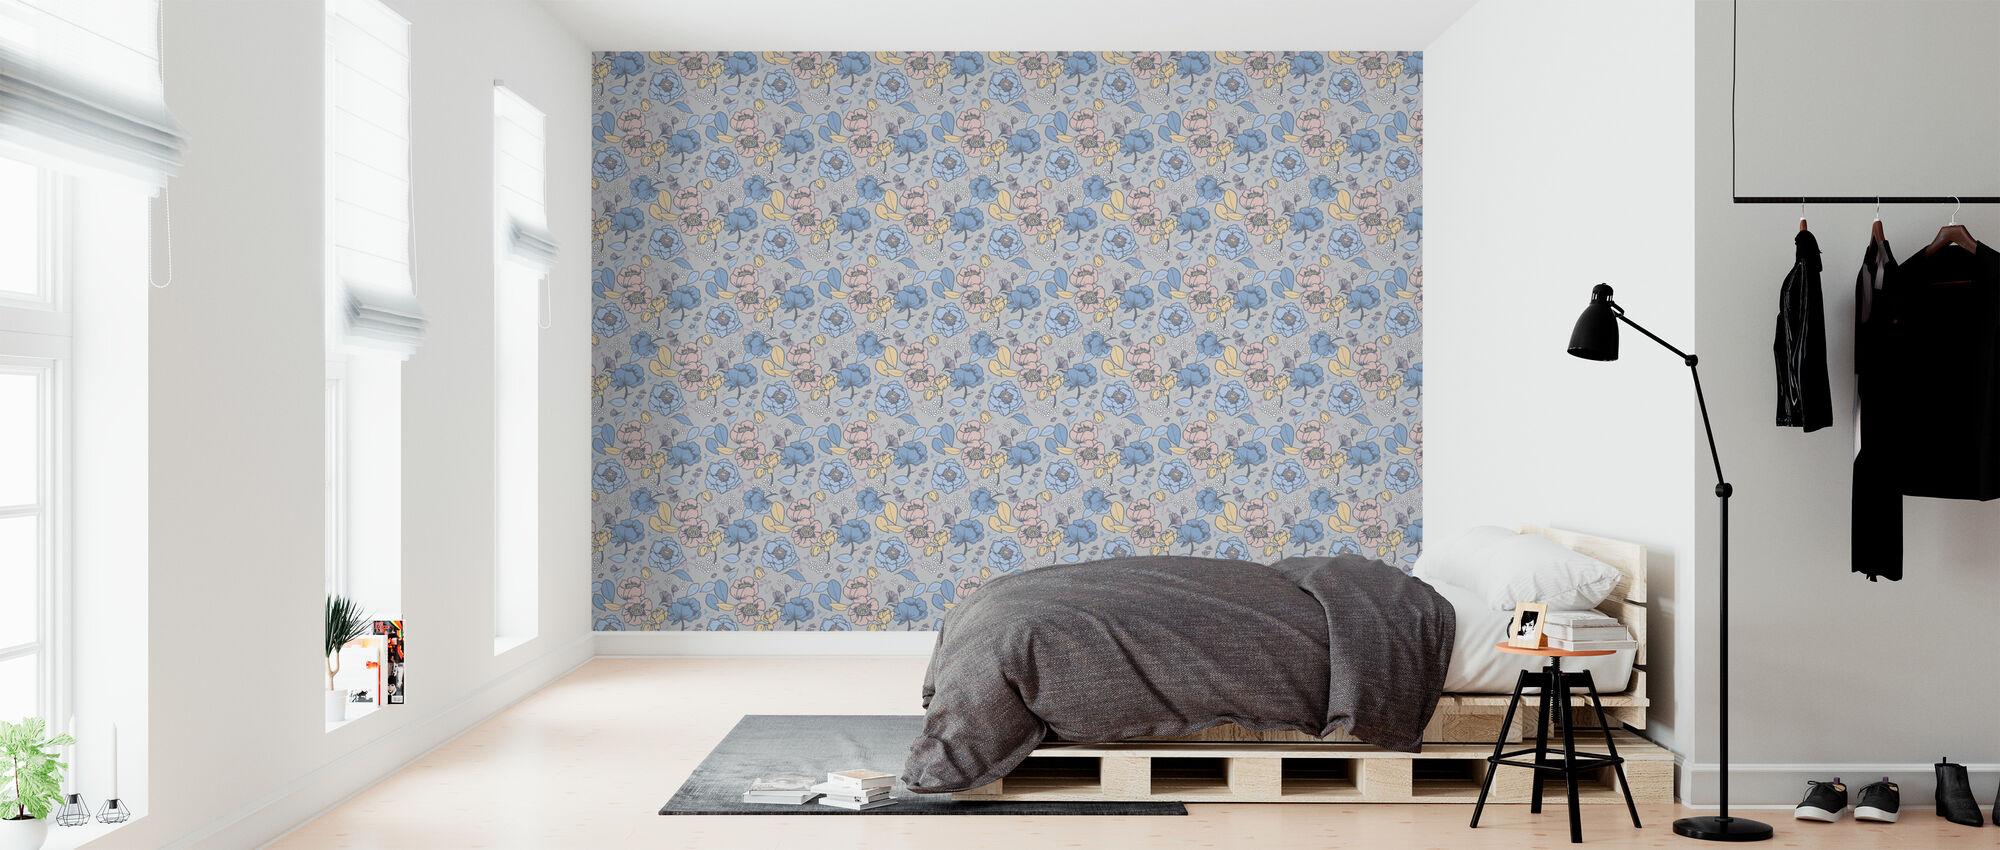 Weide - Behang - Slaapkamer